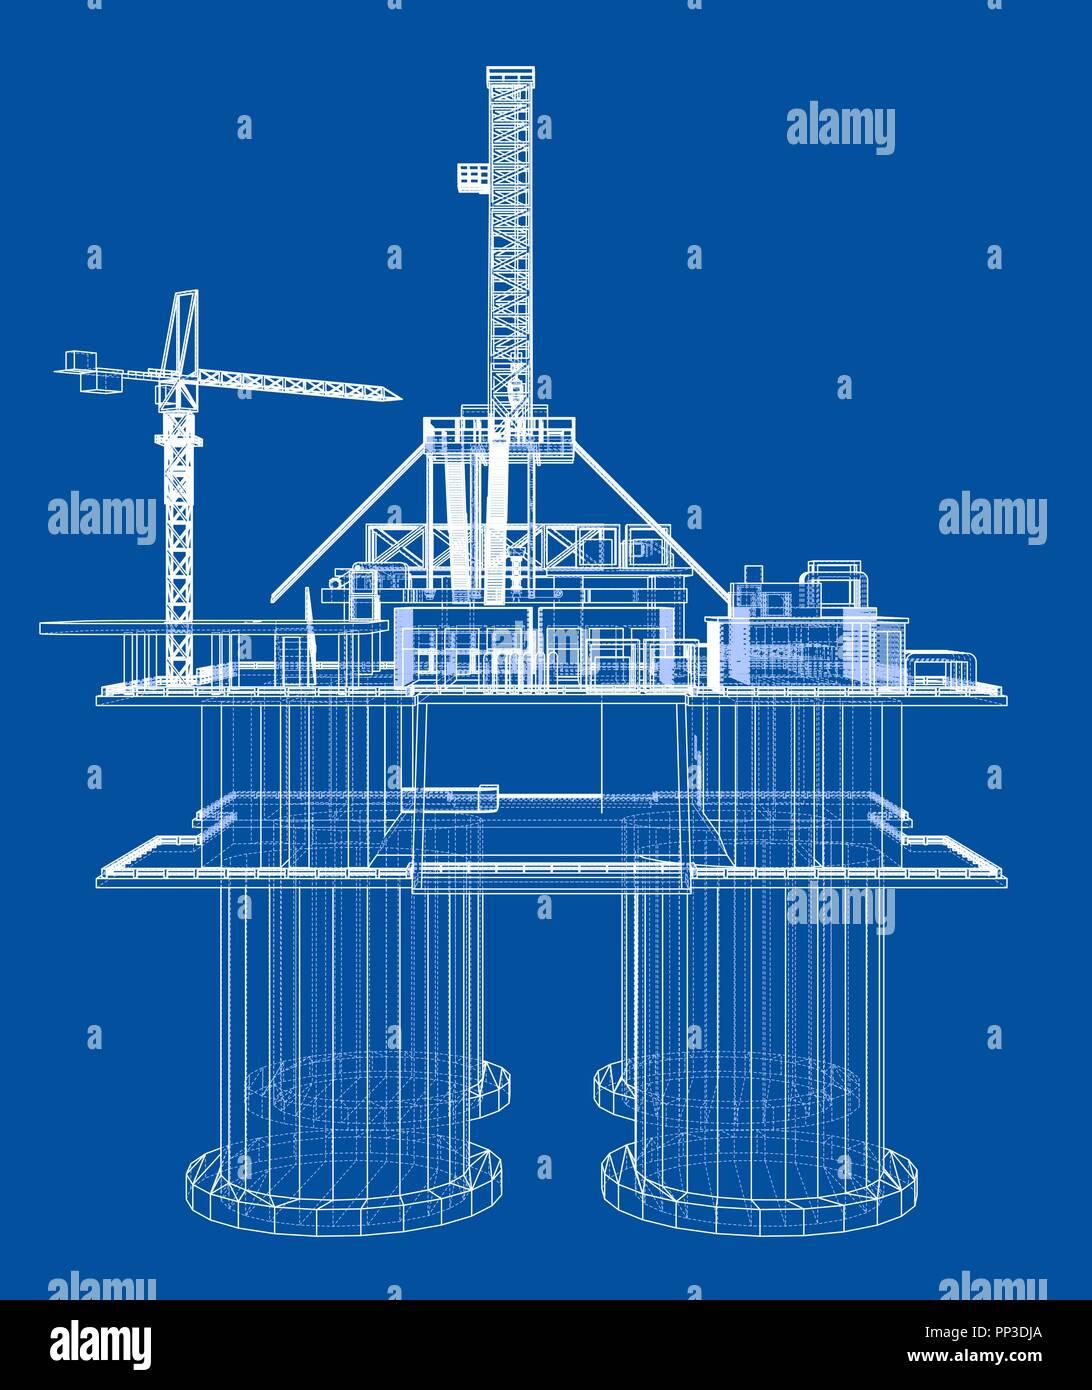 Offs oil rig drilling platform concept Stock Vector Art ... Ocean Drilling Rig Schematic Diagram on